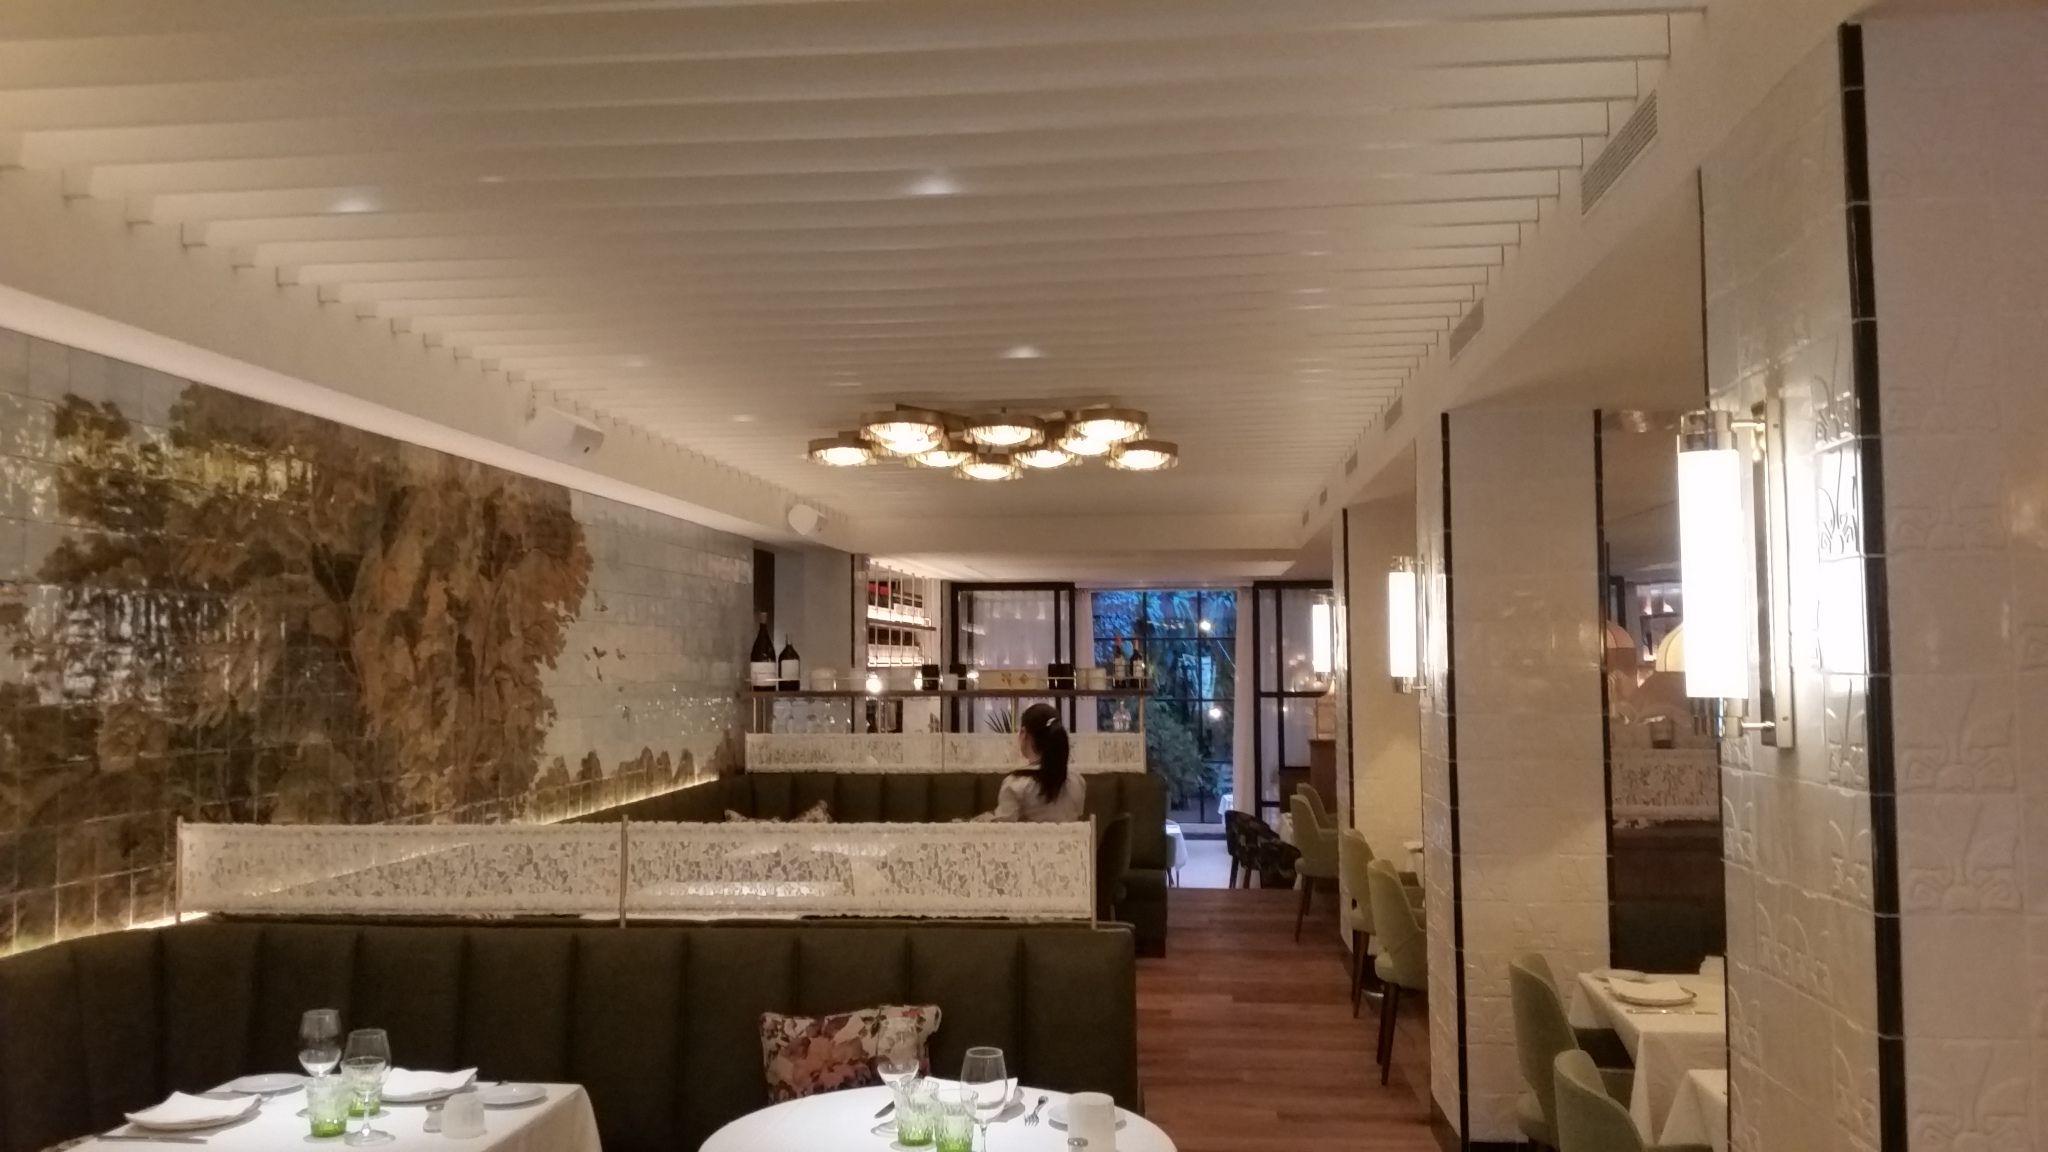 Iluminación para el restaurante l\'Olive. | Restaurantes | Pinterest